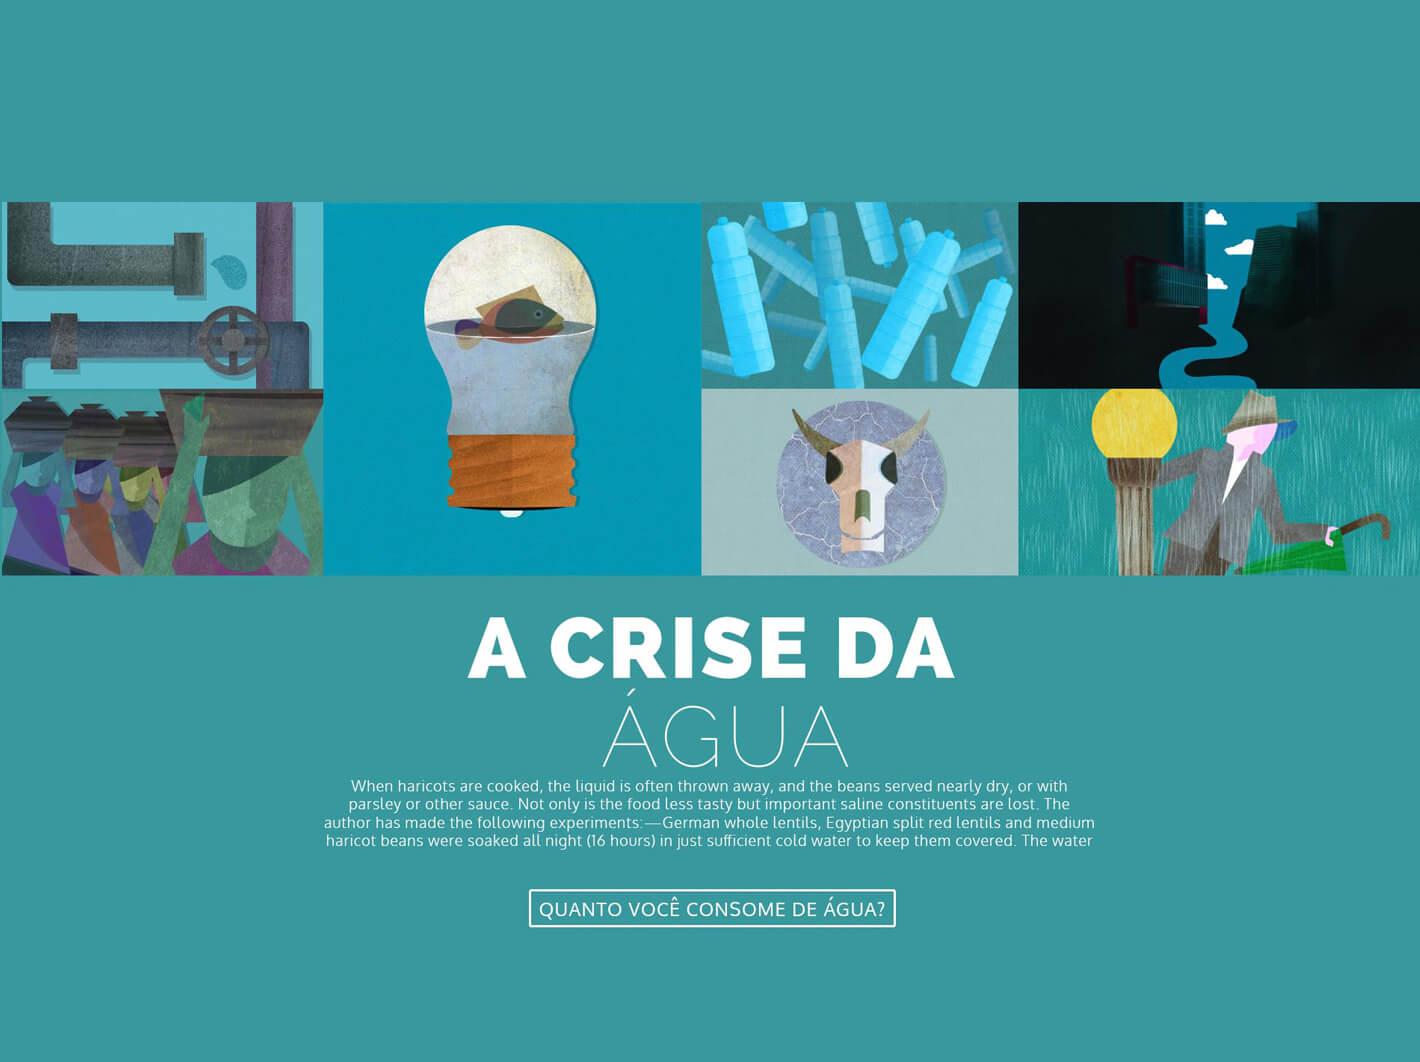 A crise da Água - Revista Superinteressante